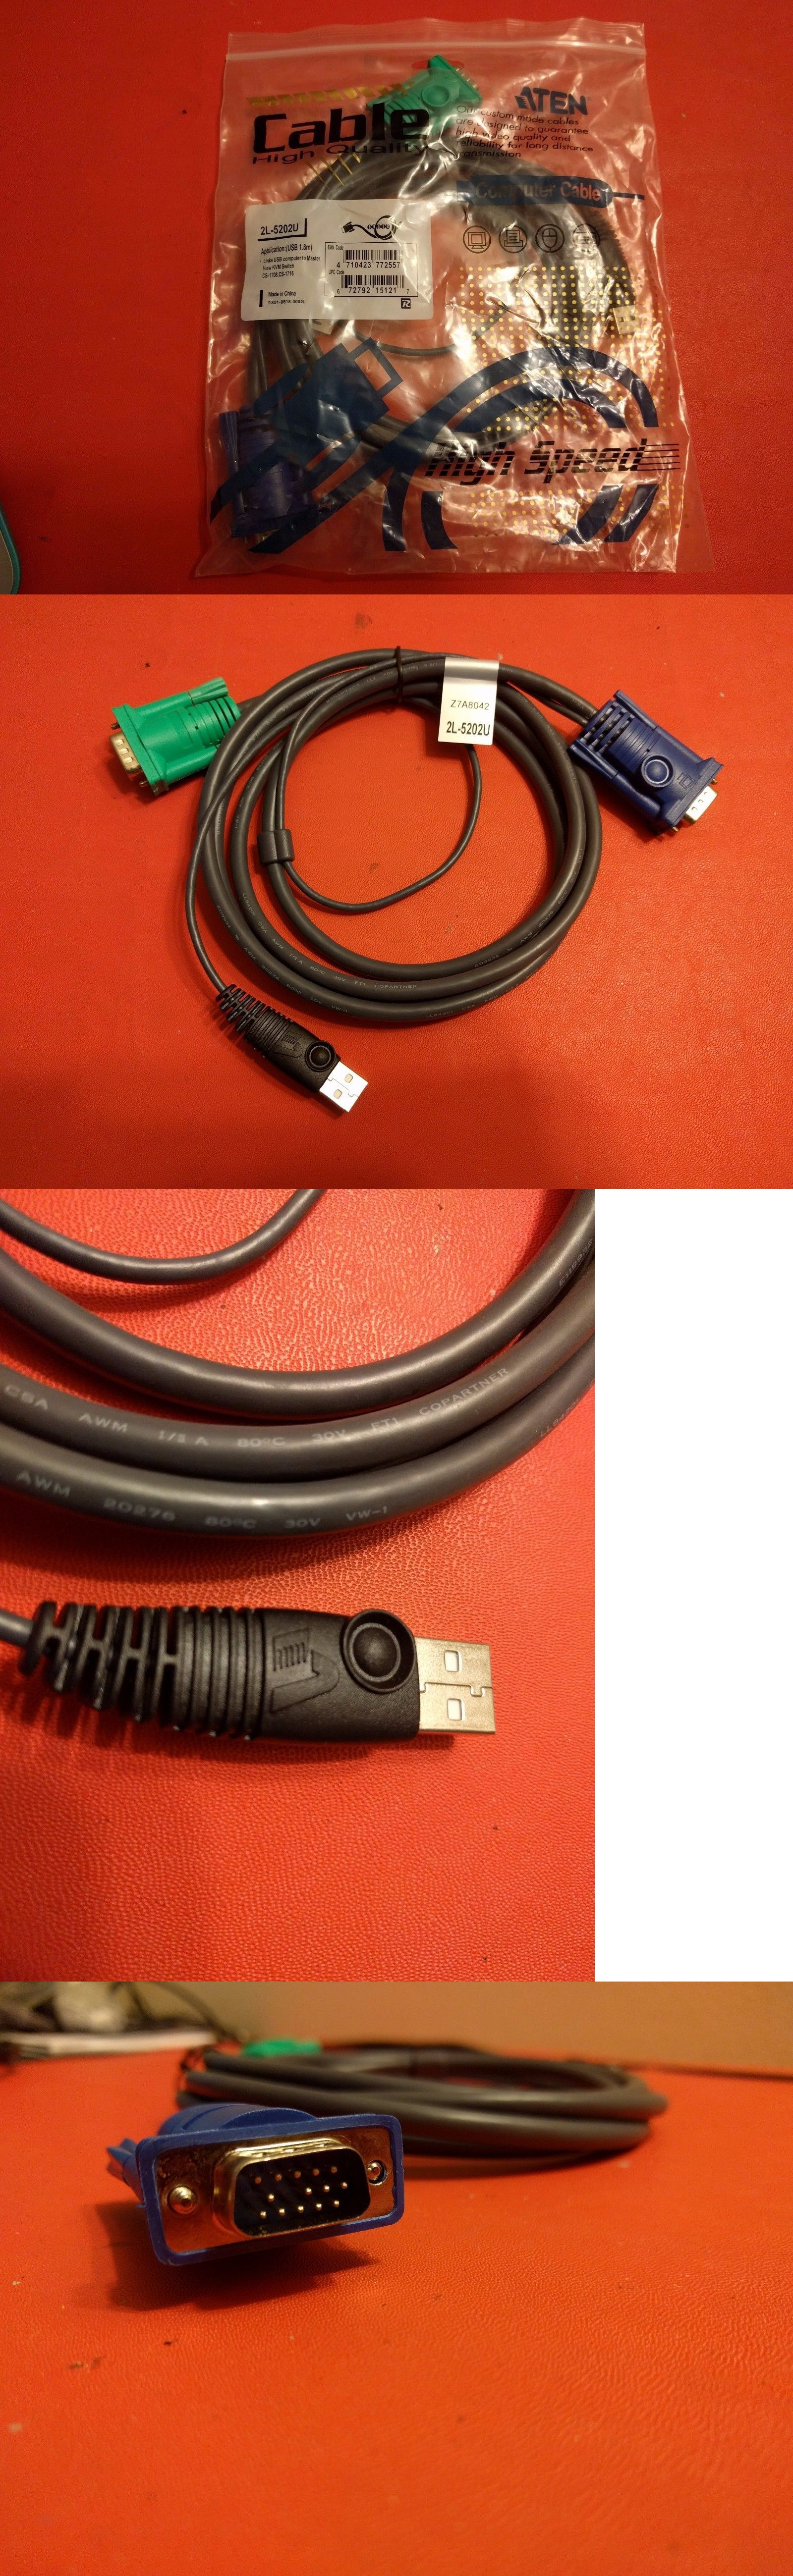 Details About Aten 6 2l 5202u Usb Vga Kvm Cable Cs 1708 Cs 1716 Retail Pack Ebay Usb Stuff To Buy